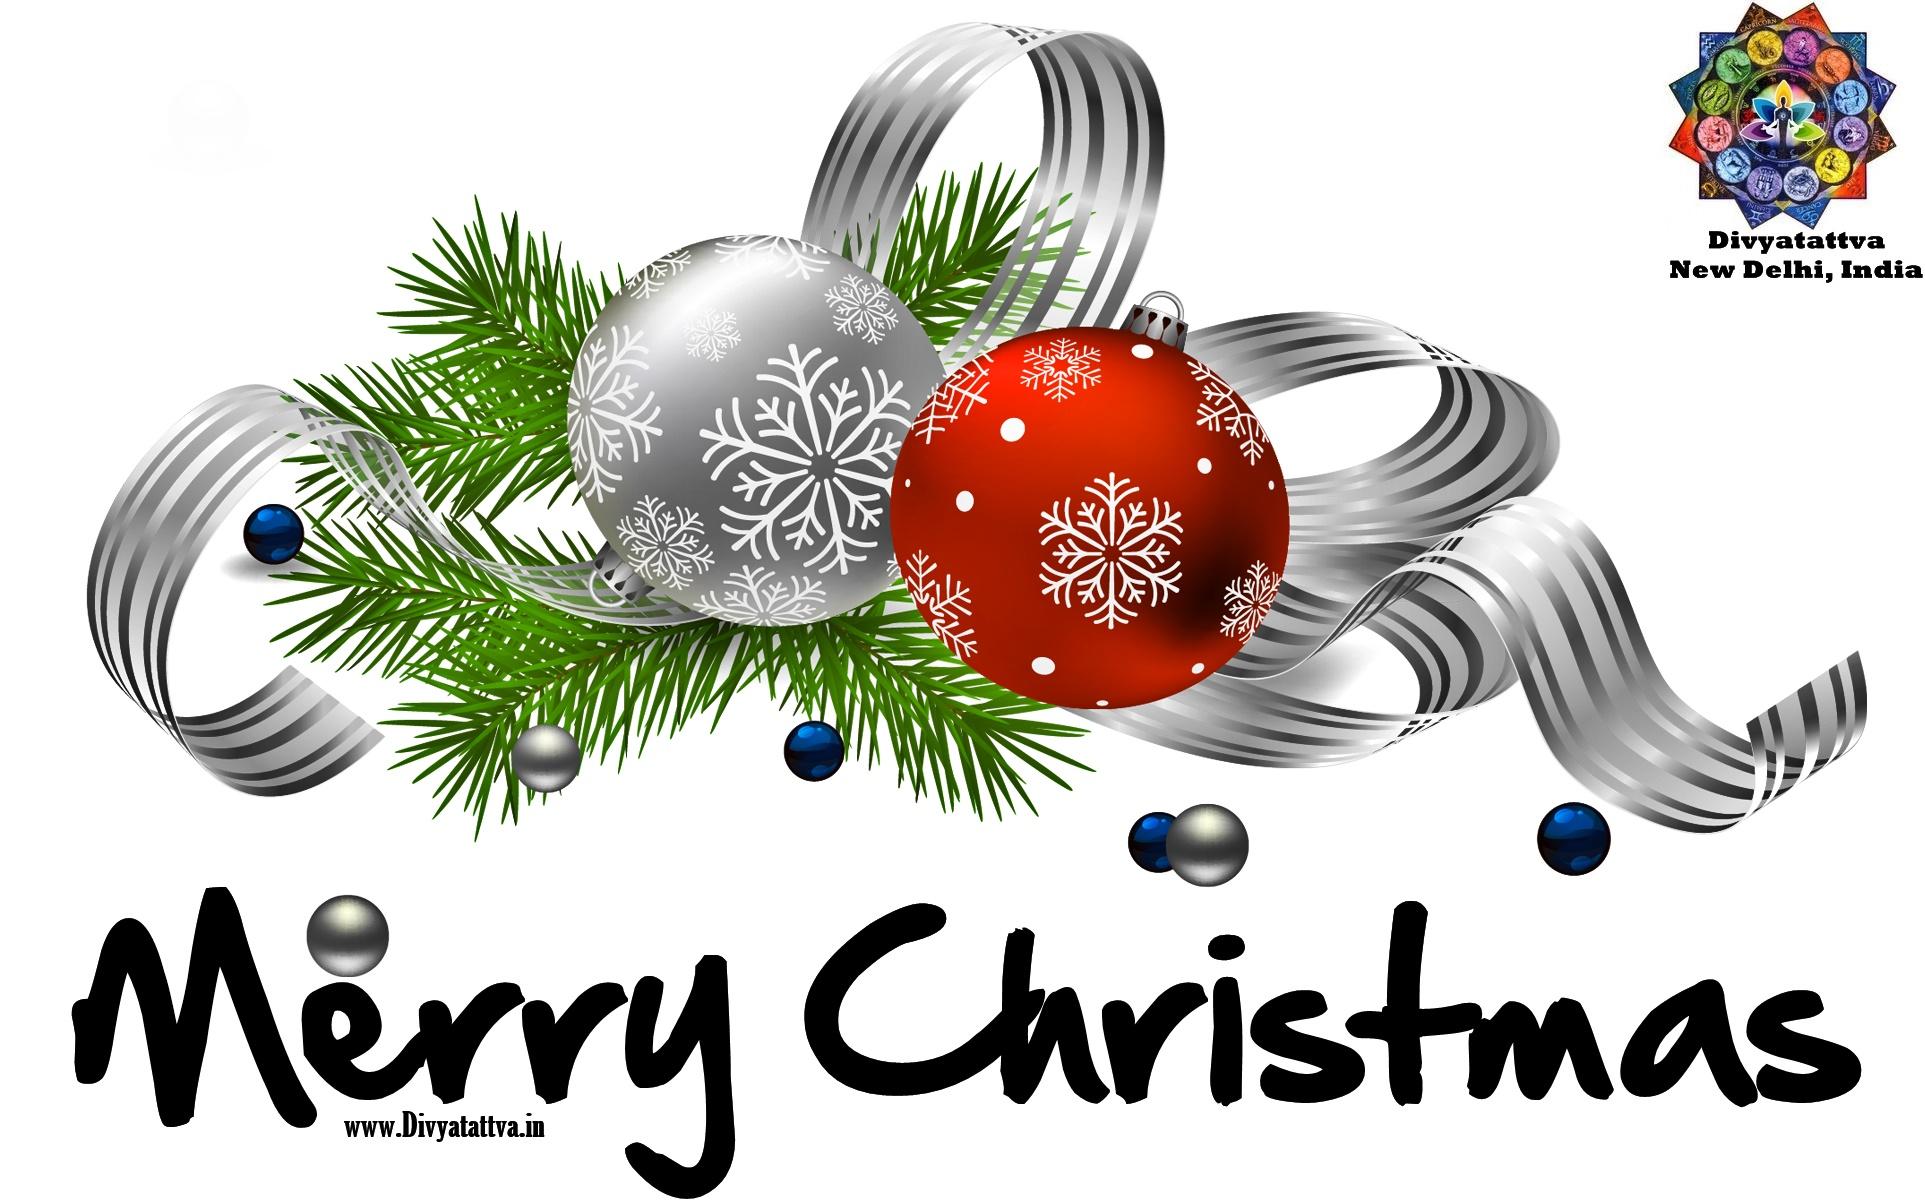 christmas tree wallpaper, cute christmas wallpapers greeting, Xmas Messages  hd christmas wallpapers 1080p,  christmas wallpaper iphone, christmas wallpaper phone